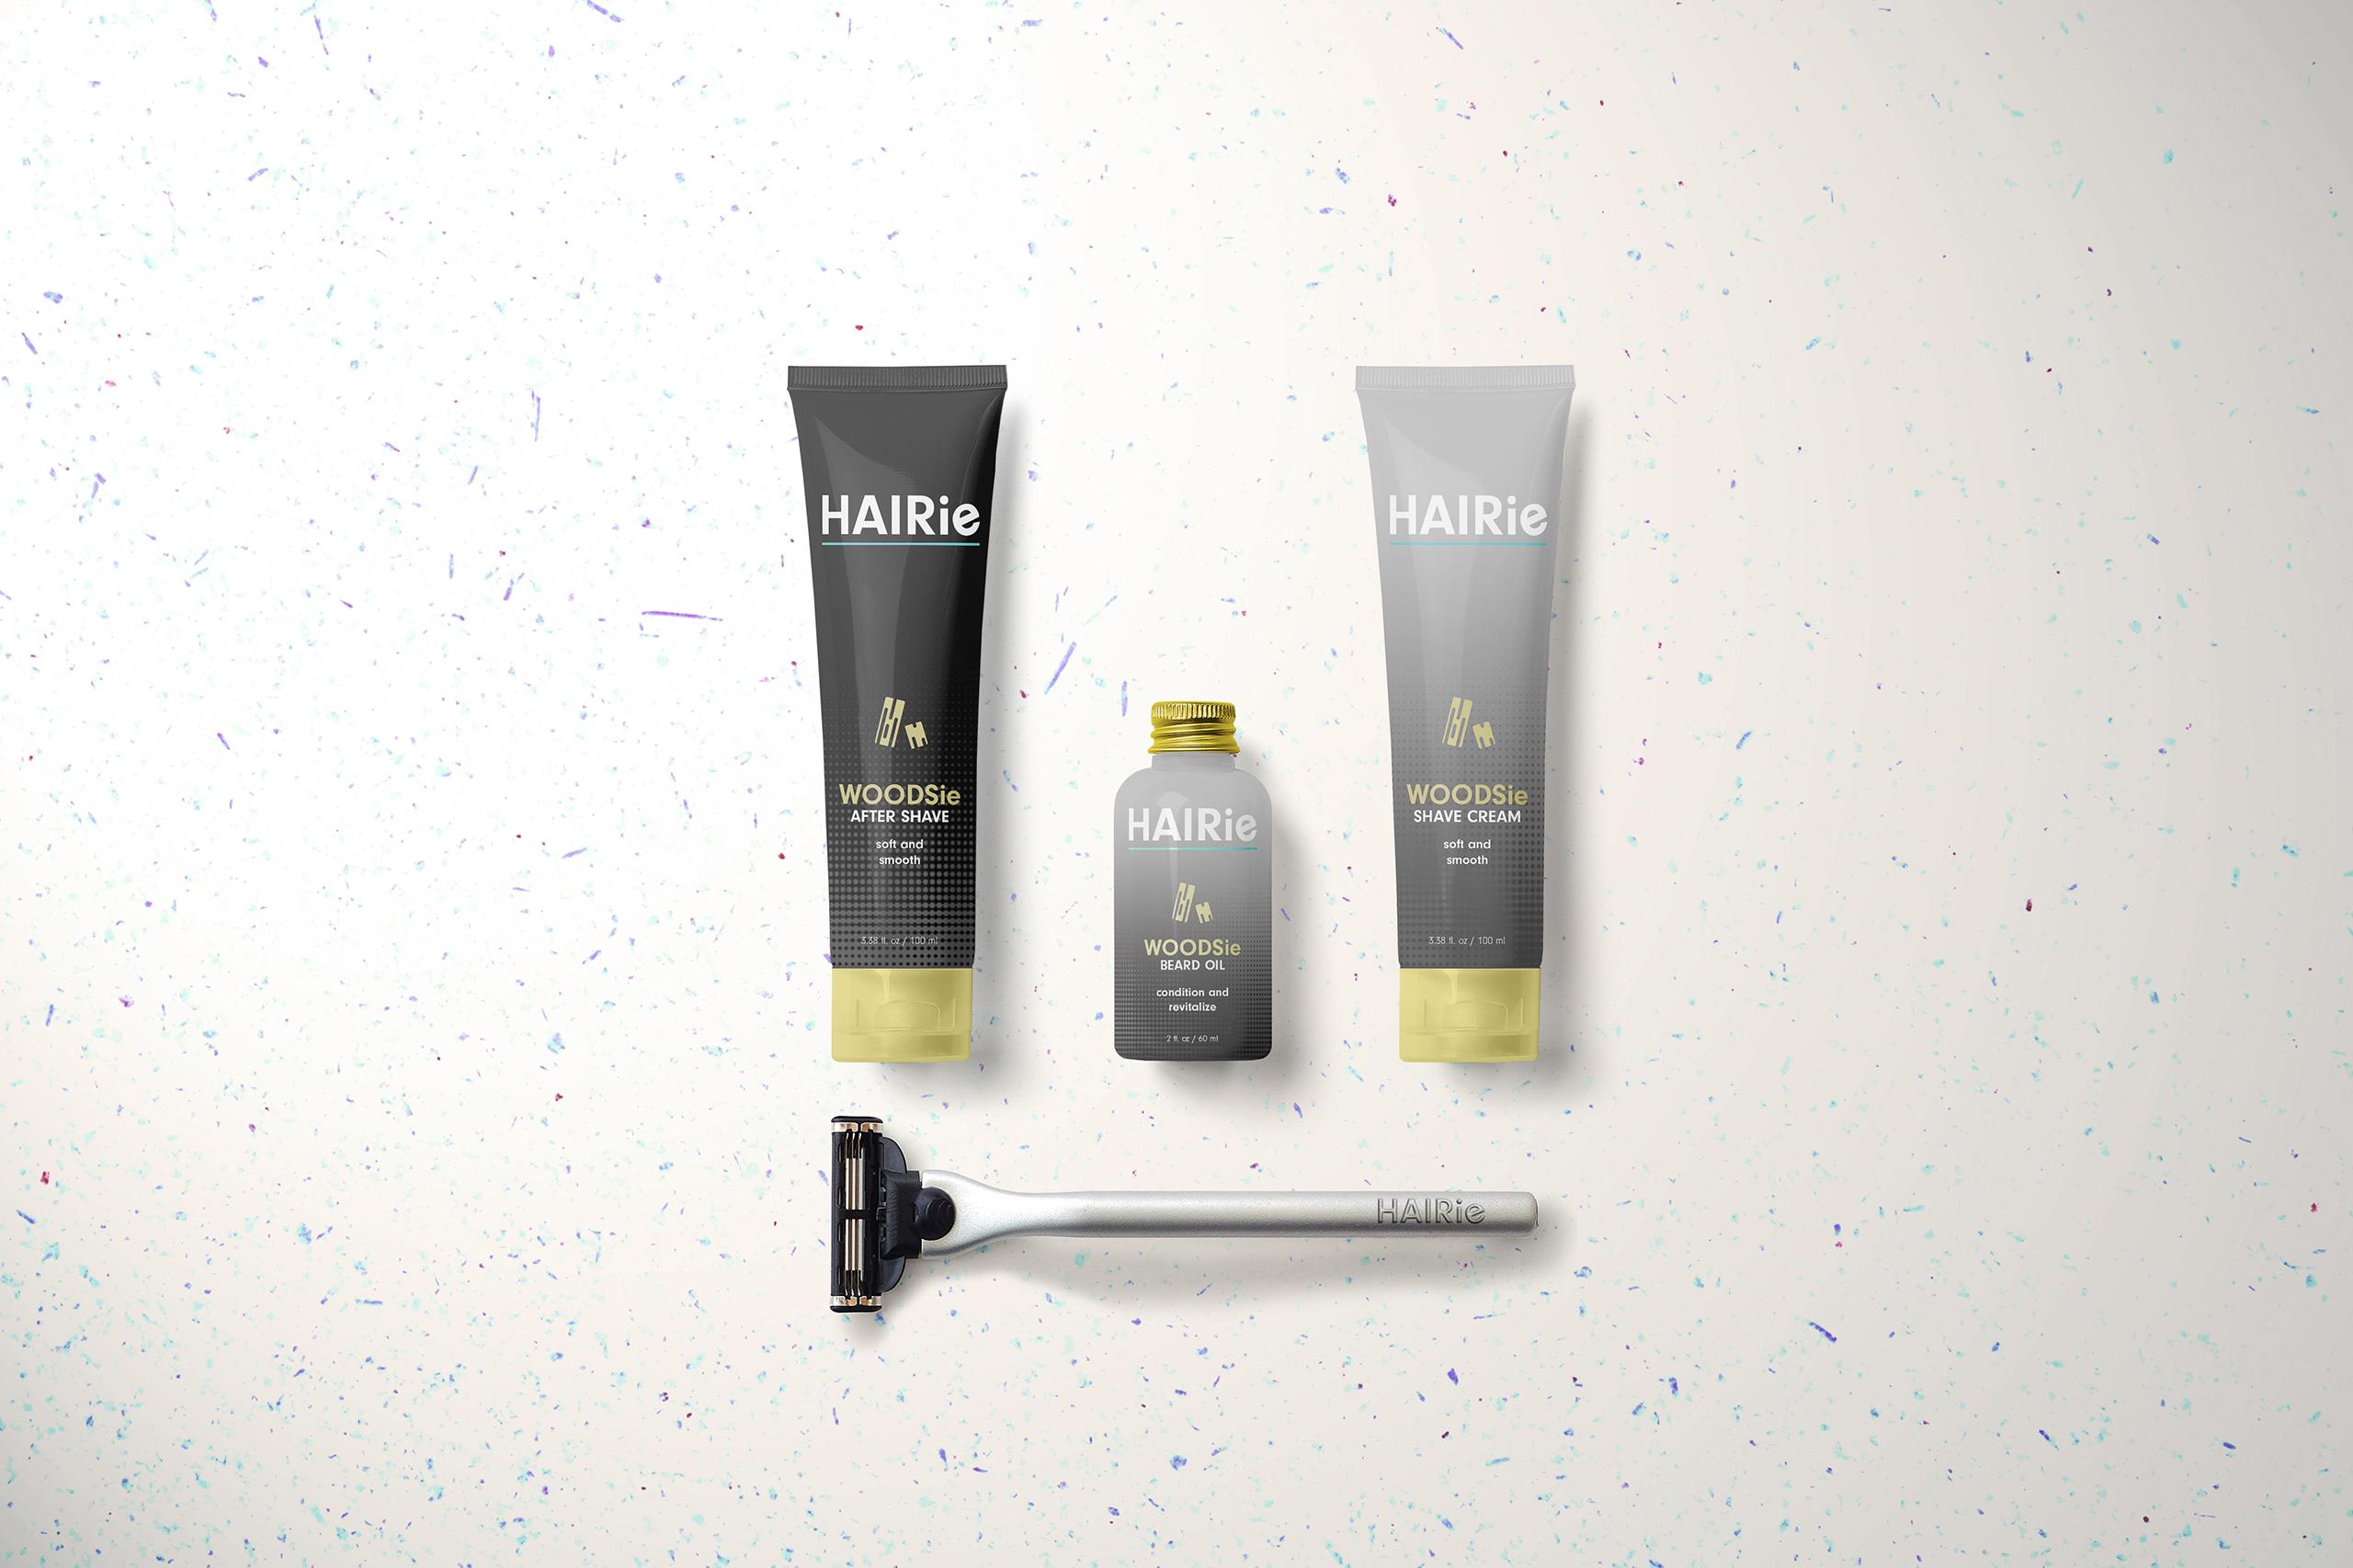 Hairie Woodsie shave kit